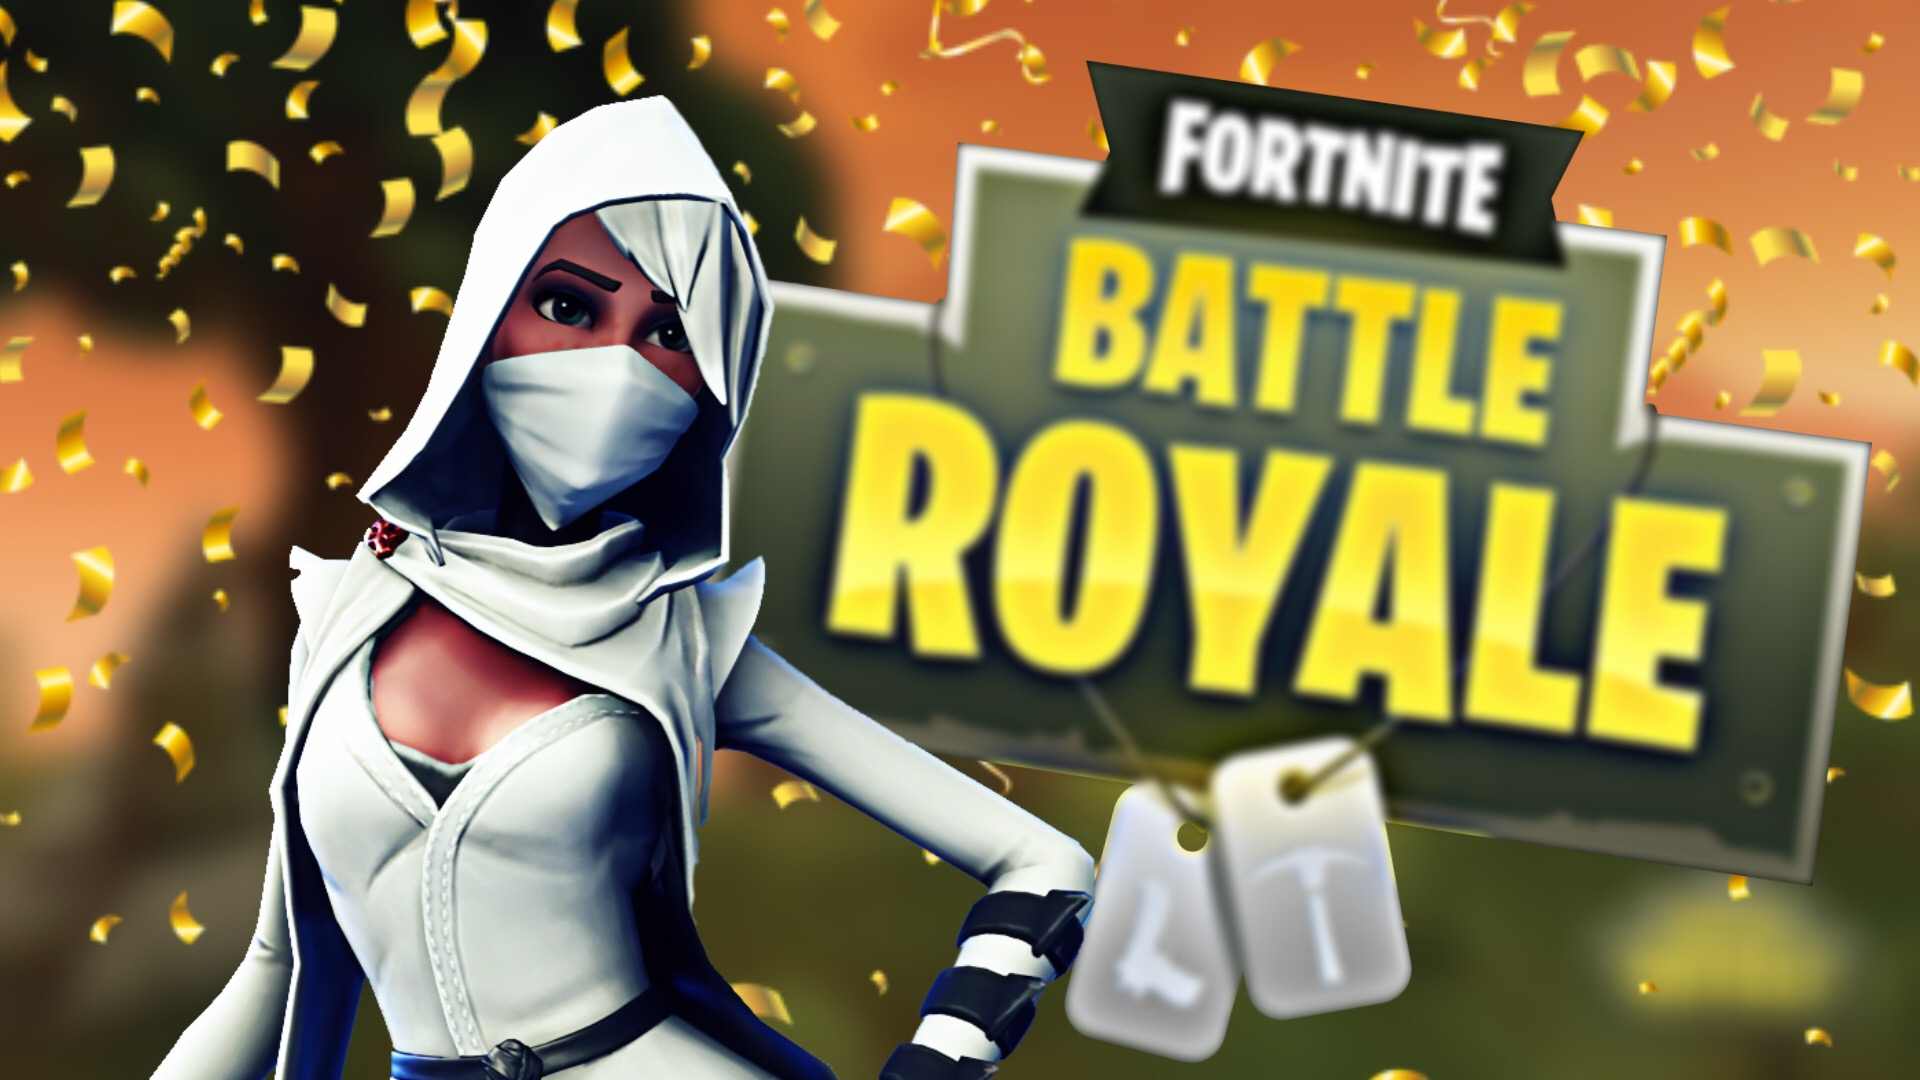 Fortnite Thumbnail Ninja Battleroyale Freetoedit